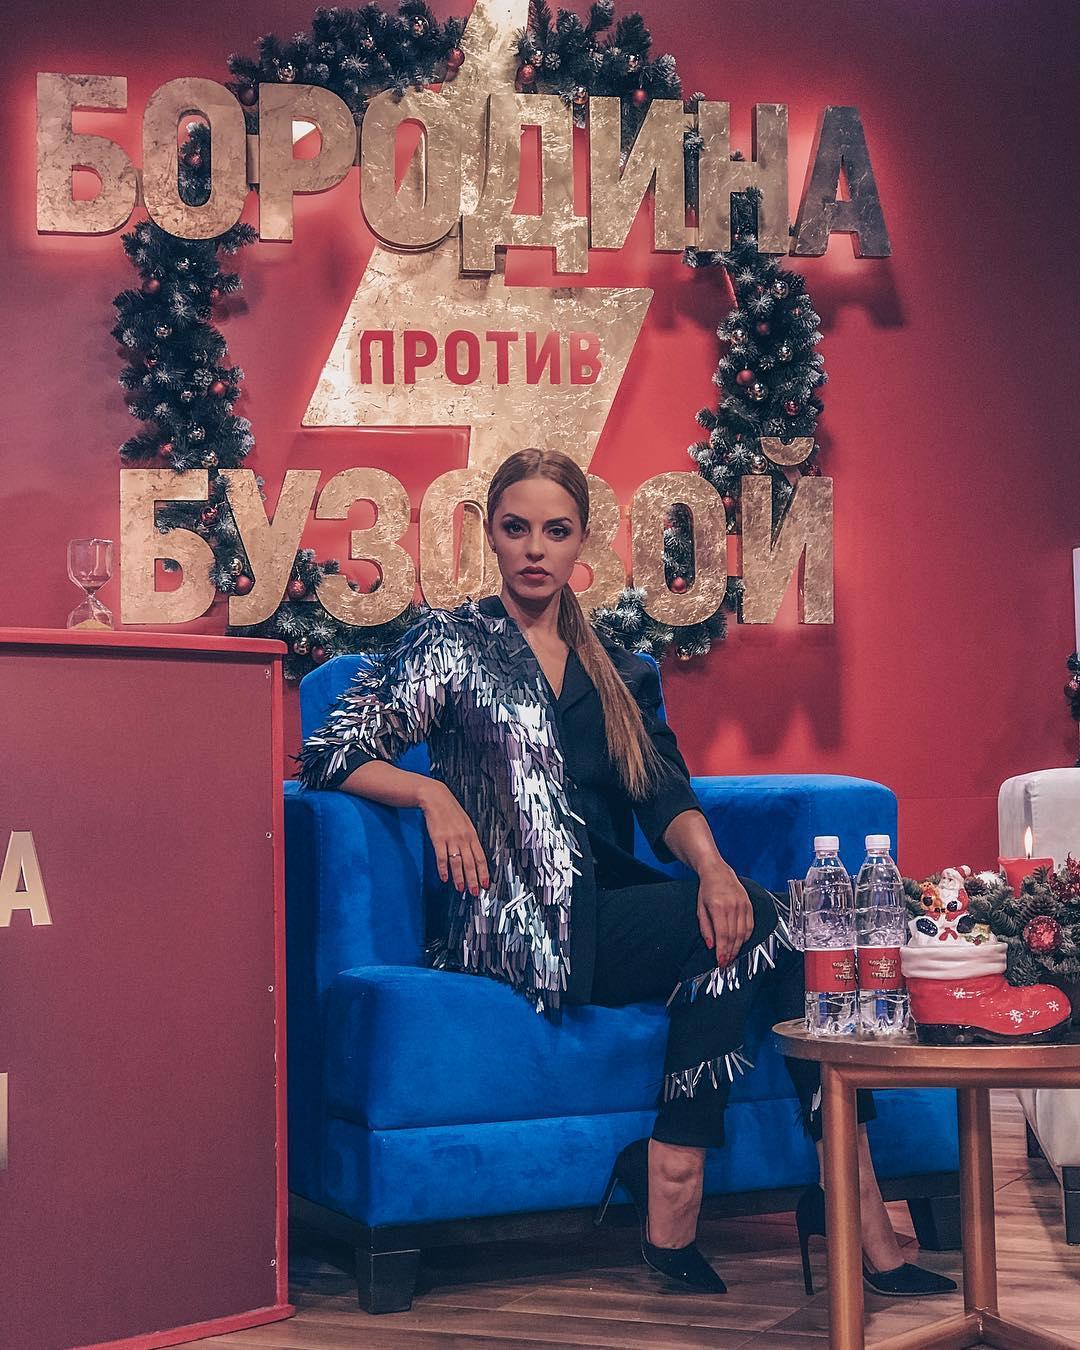 Юлия Ефременкова @efremenkovvva - ведущая телепроекта «ДОМ-2»